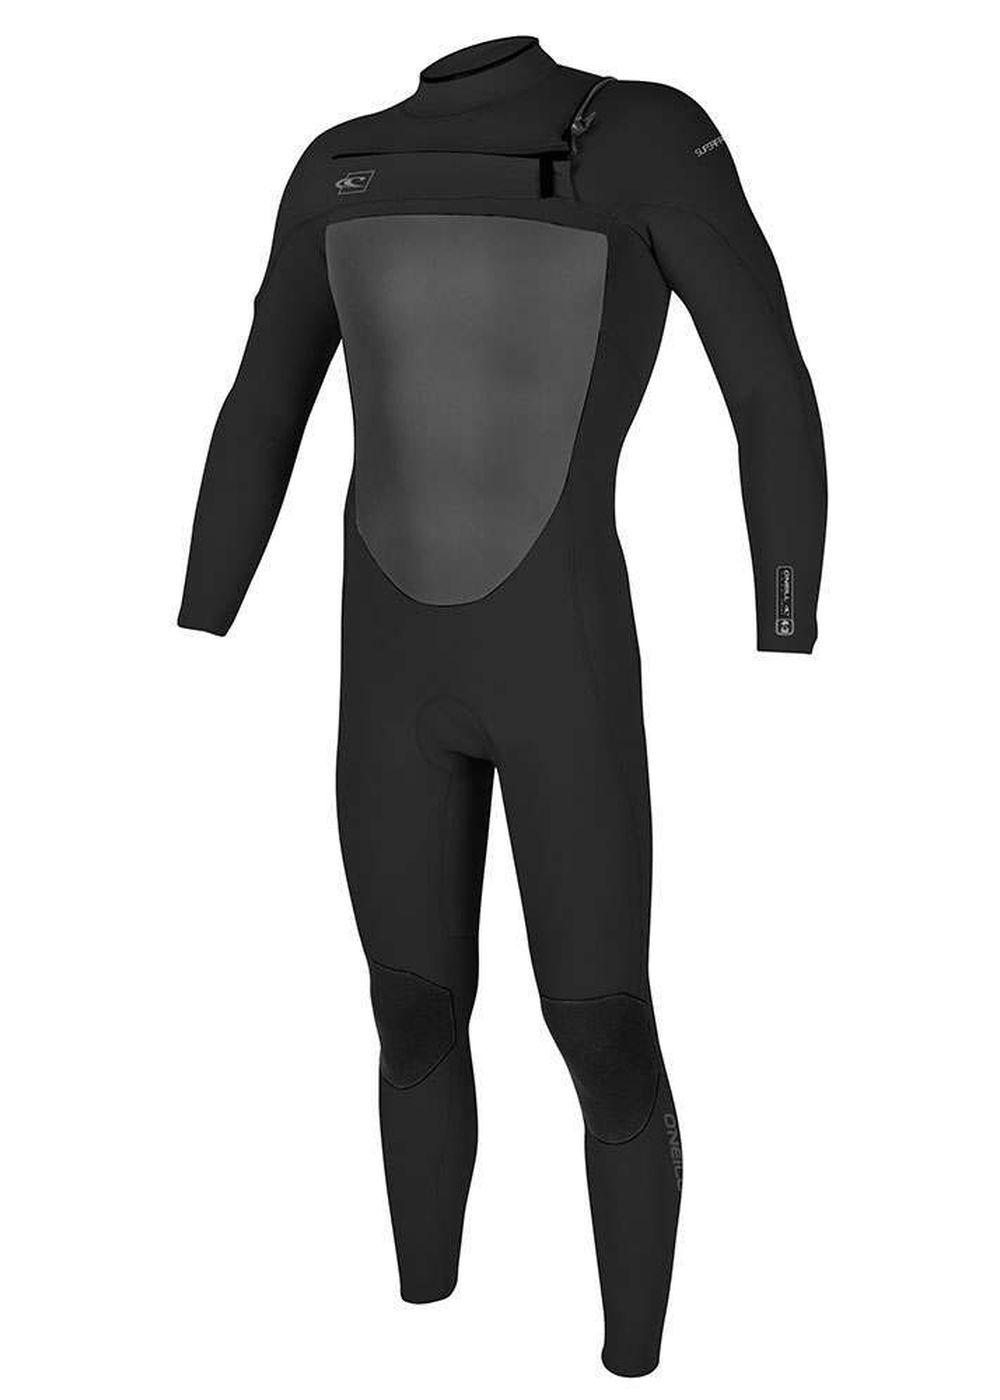 Oneill Superfreak Fz 3/2 Gbs Wetsuit Black 2017 Picture